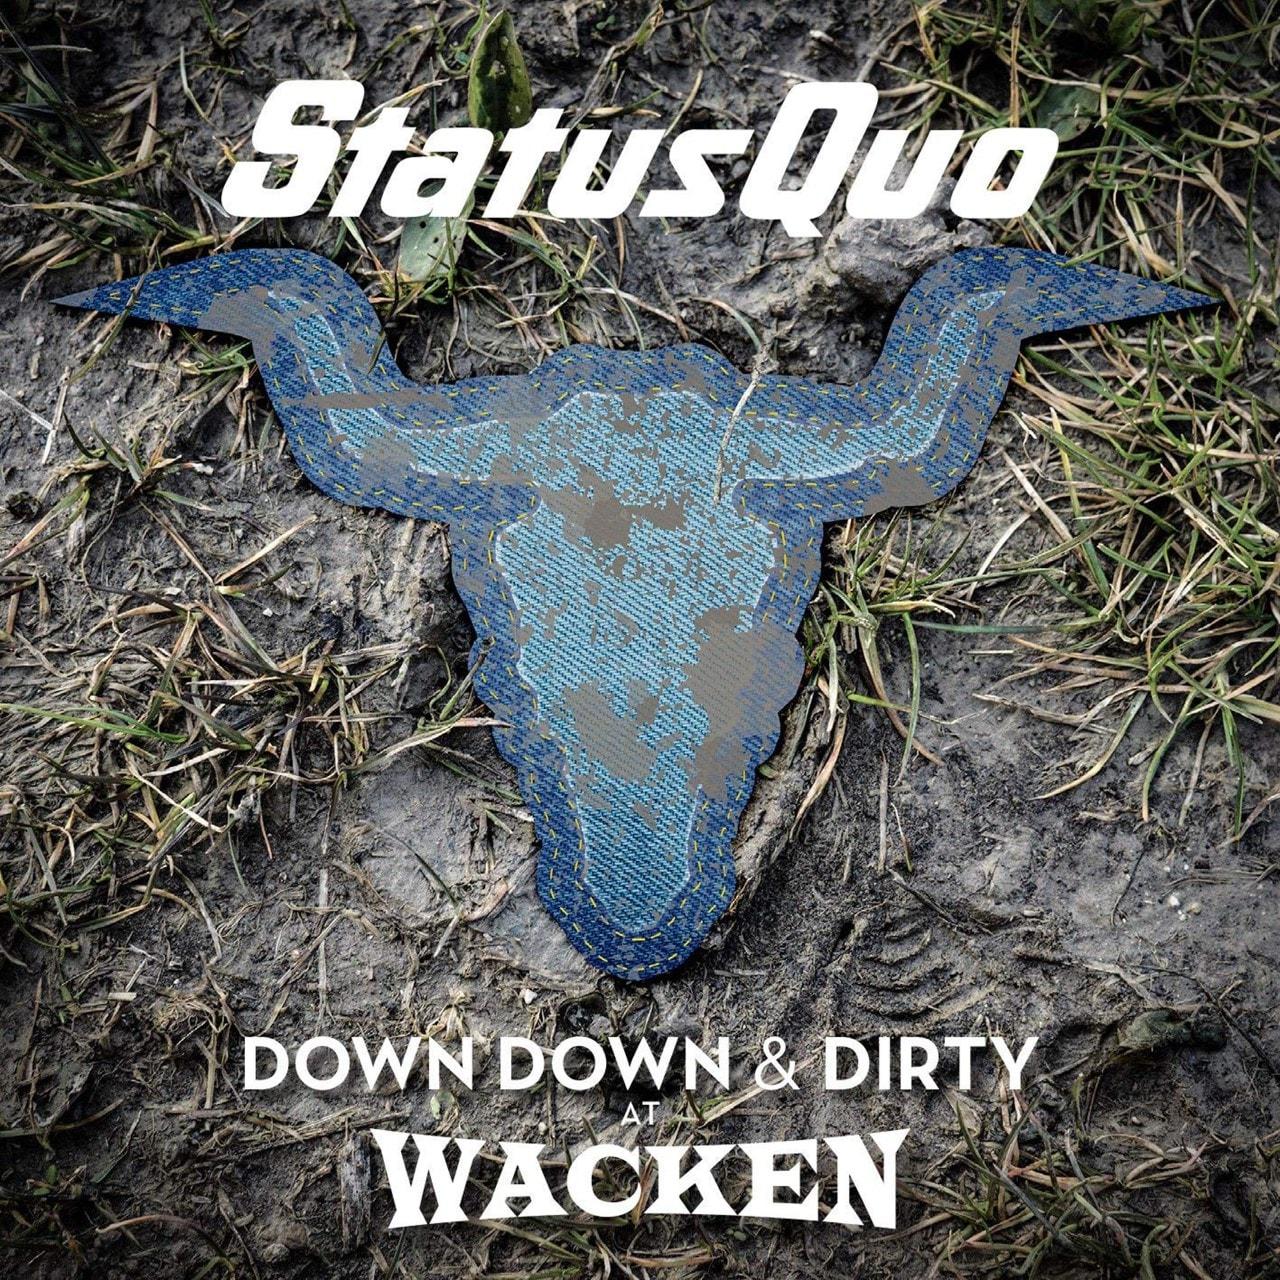 Down Down & Dirty at Wacken - 1